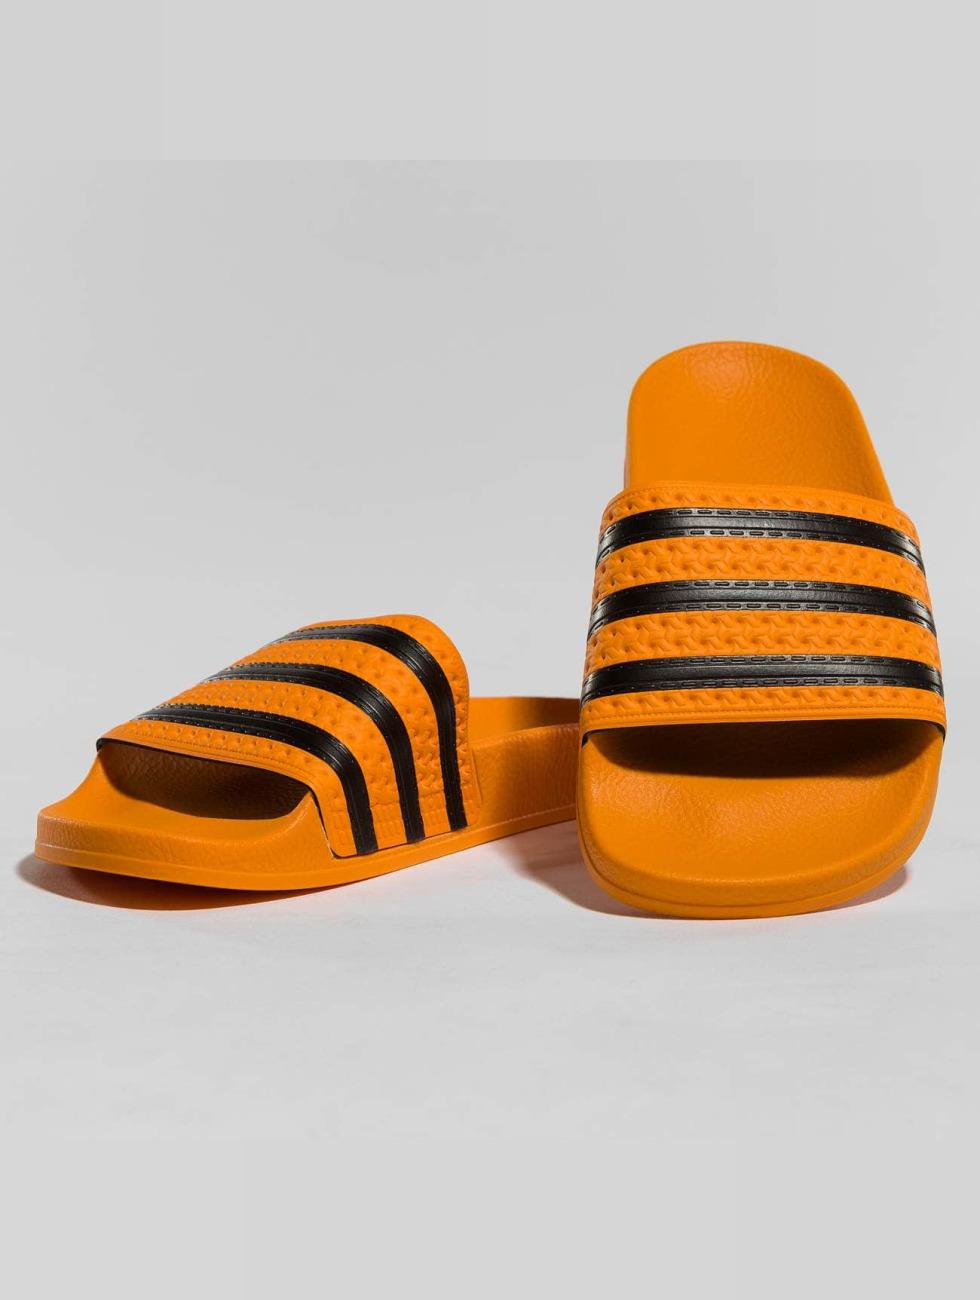 Adidas Originals Strisce Scarpa / Ciabatta / Sandalo In Arancione 508 155 Bg2TPpvSZ6